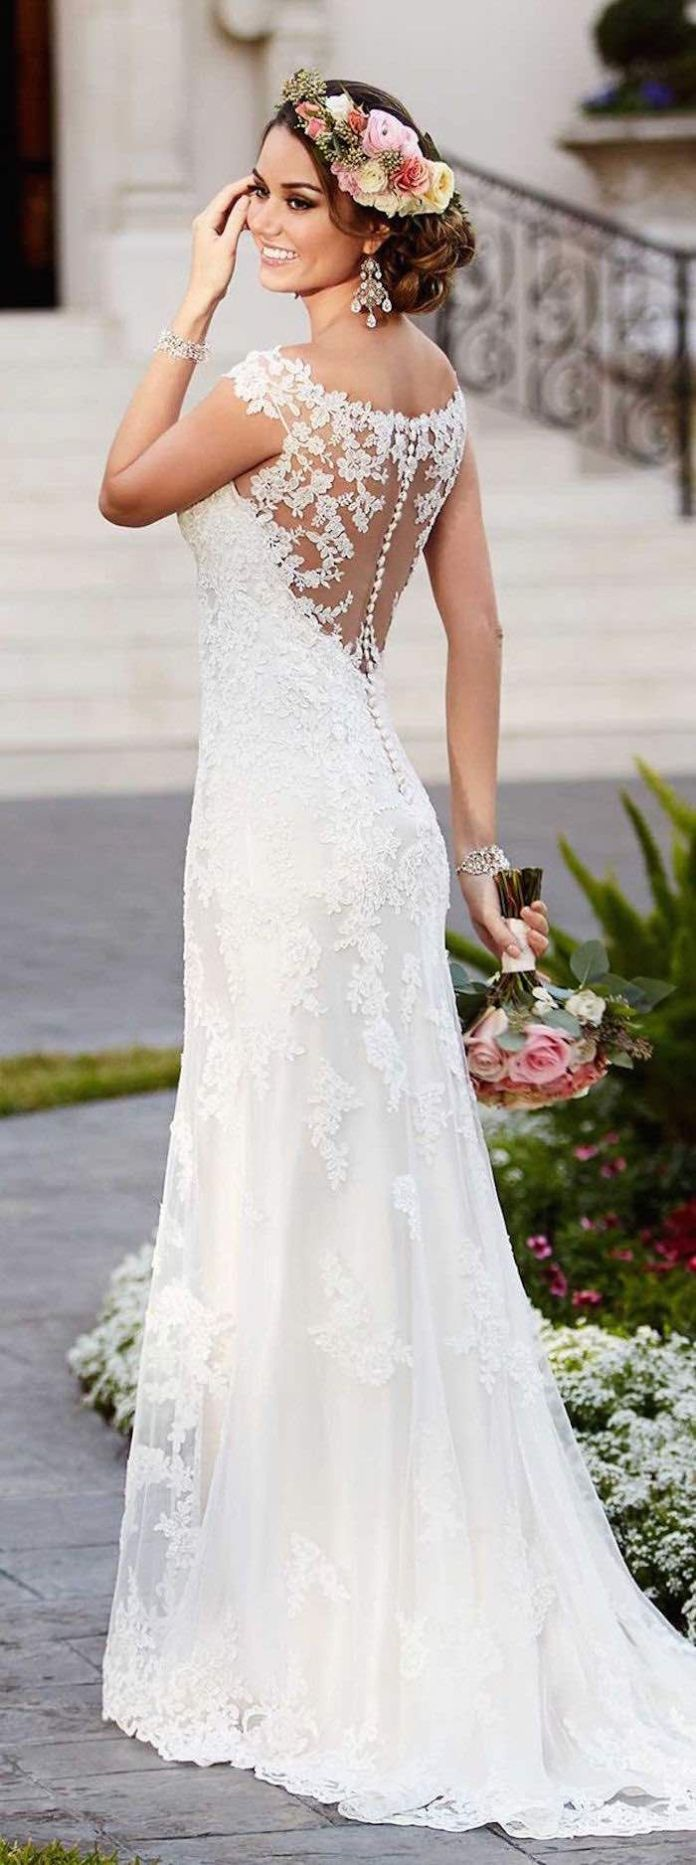 6d1a9253e55a2ad126619693c6efa9e8--lace-wedding-dresses-lace-weddings